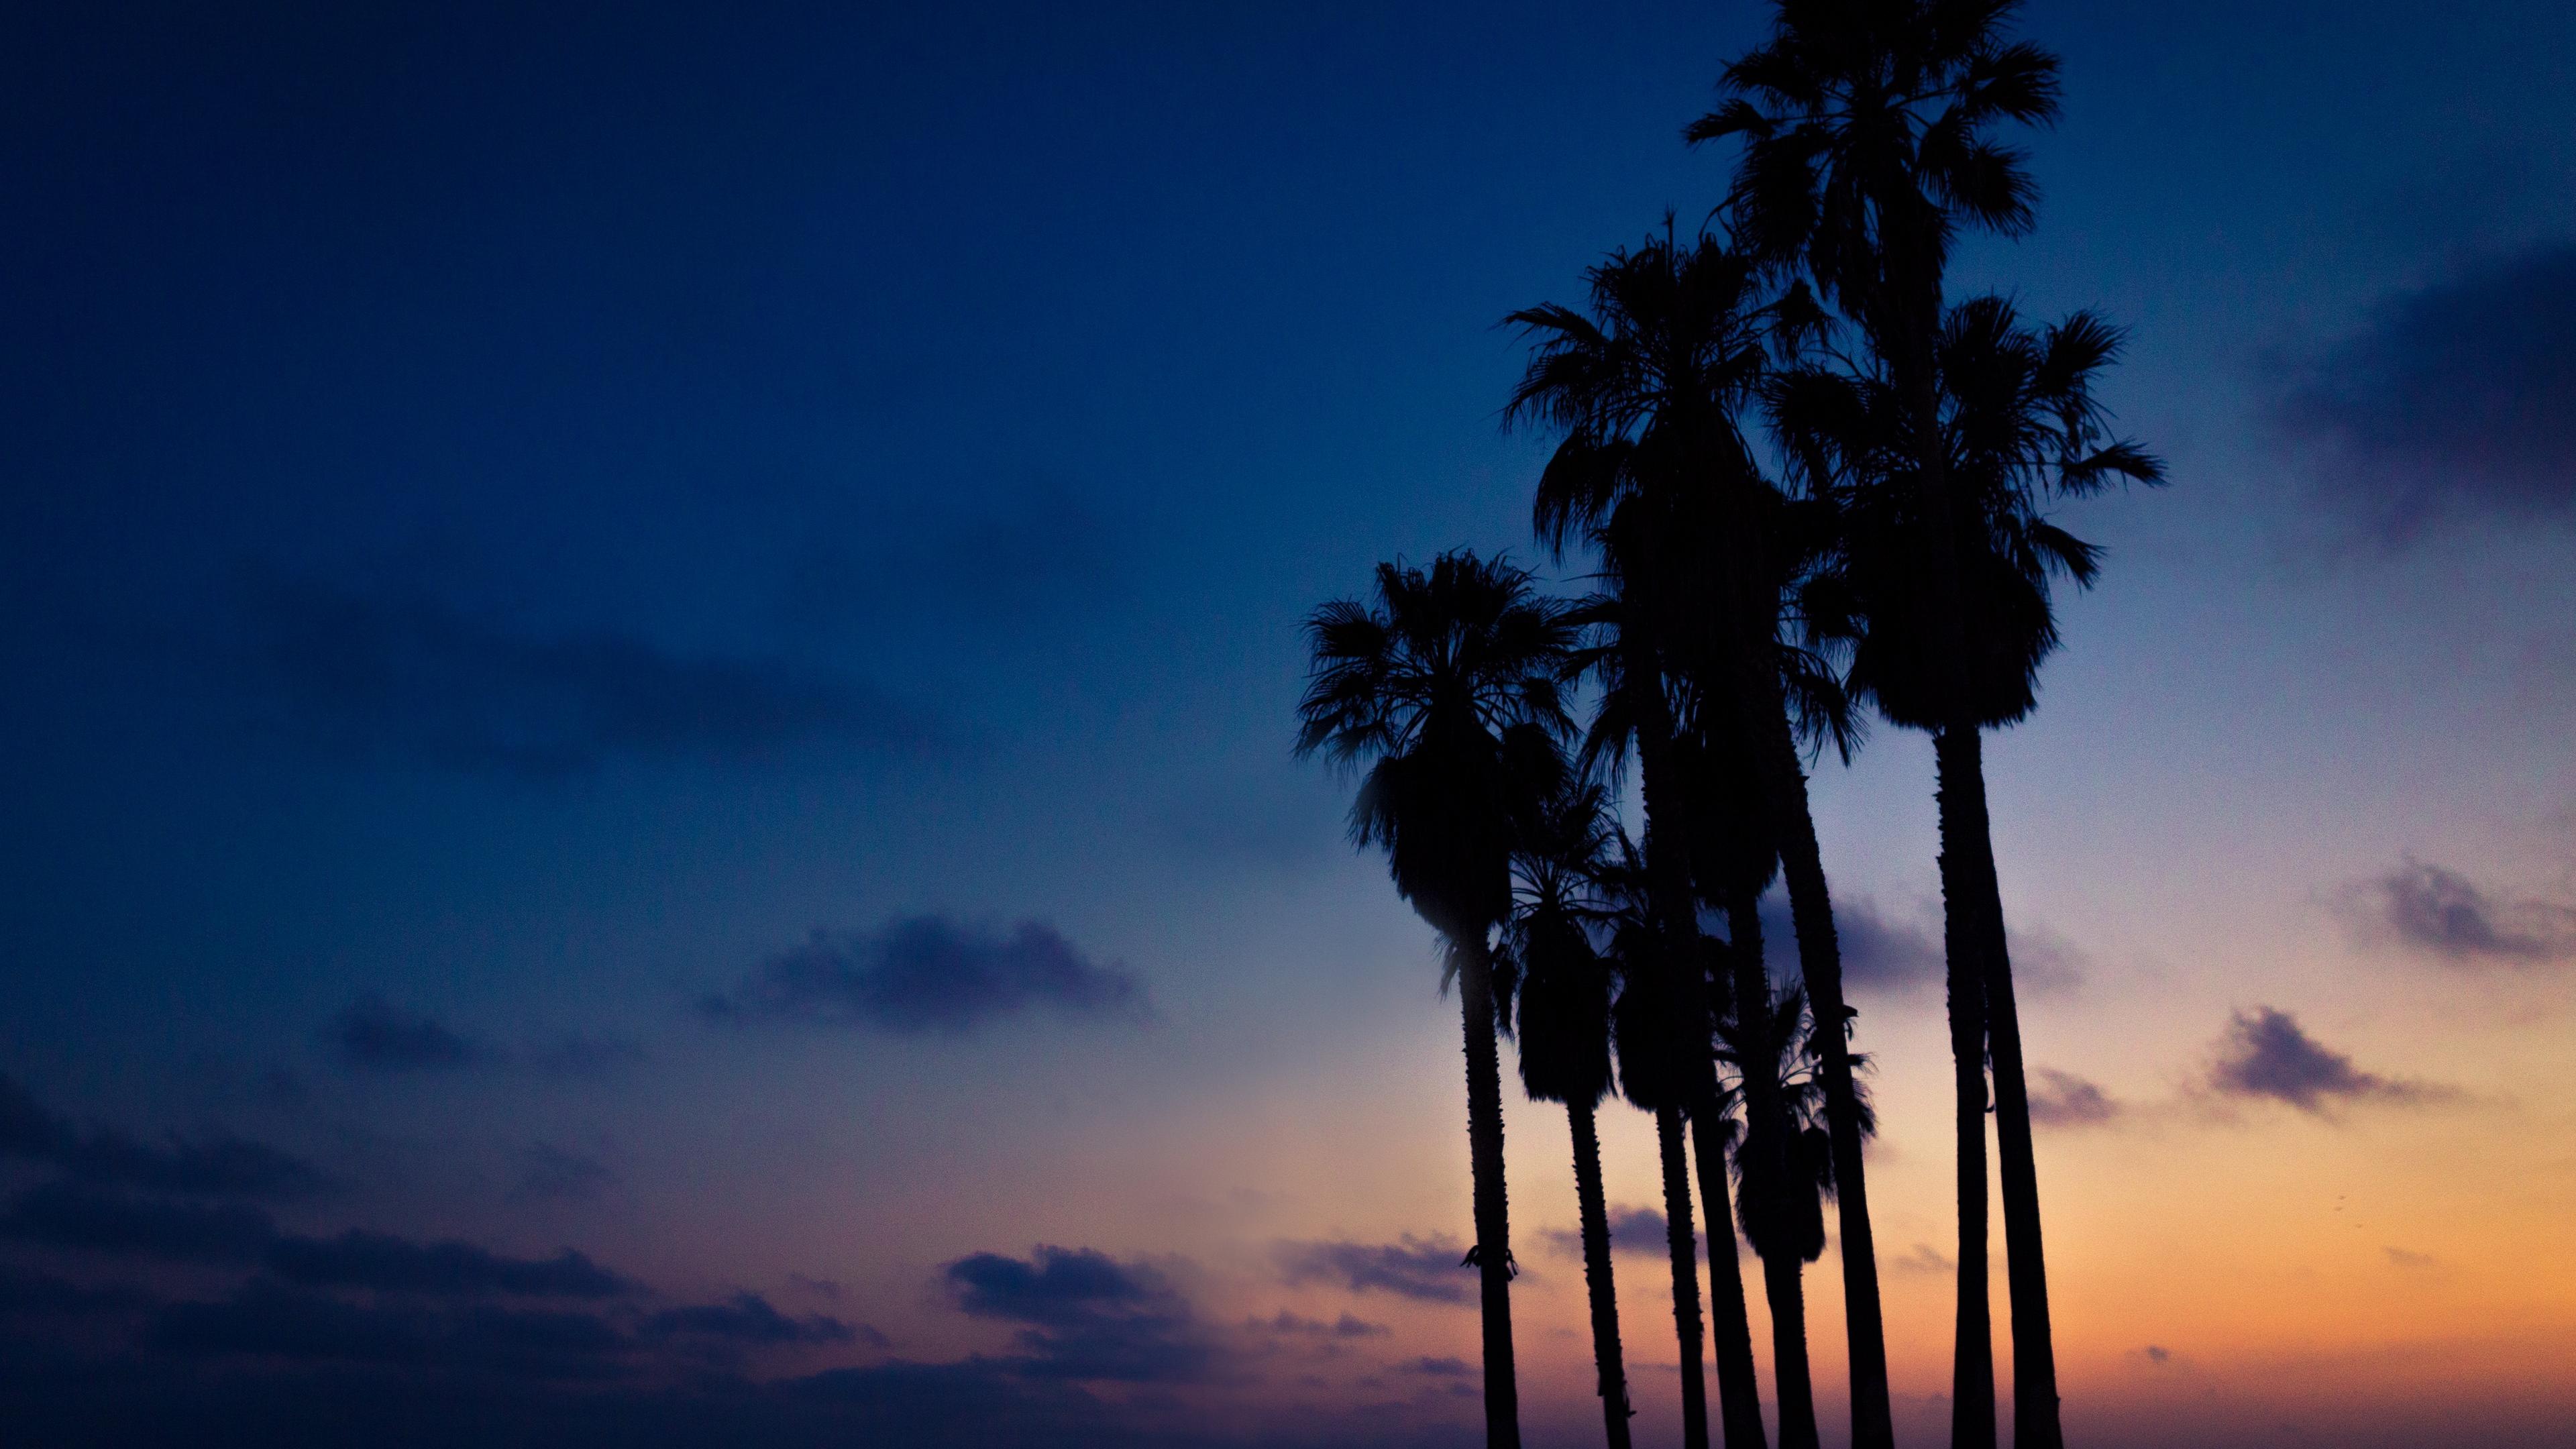 palms night sky 4k 1540576059 - palms, night, sky 4k - Sky, palms, Night